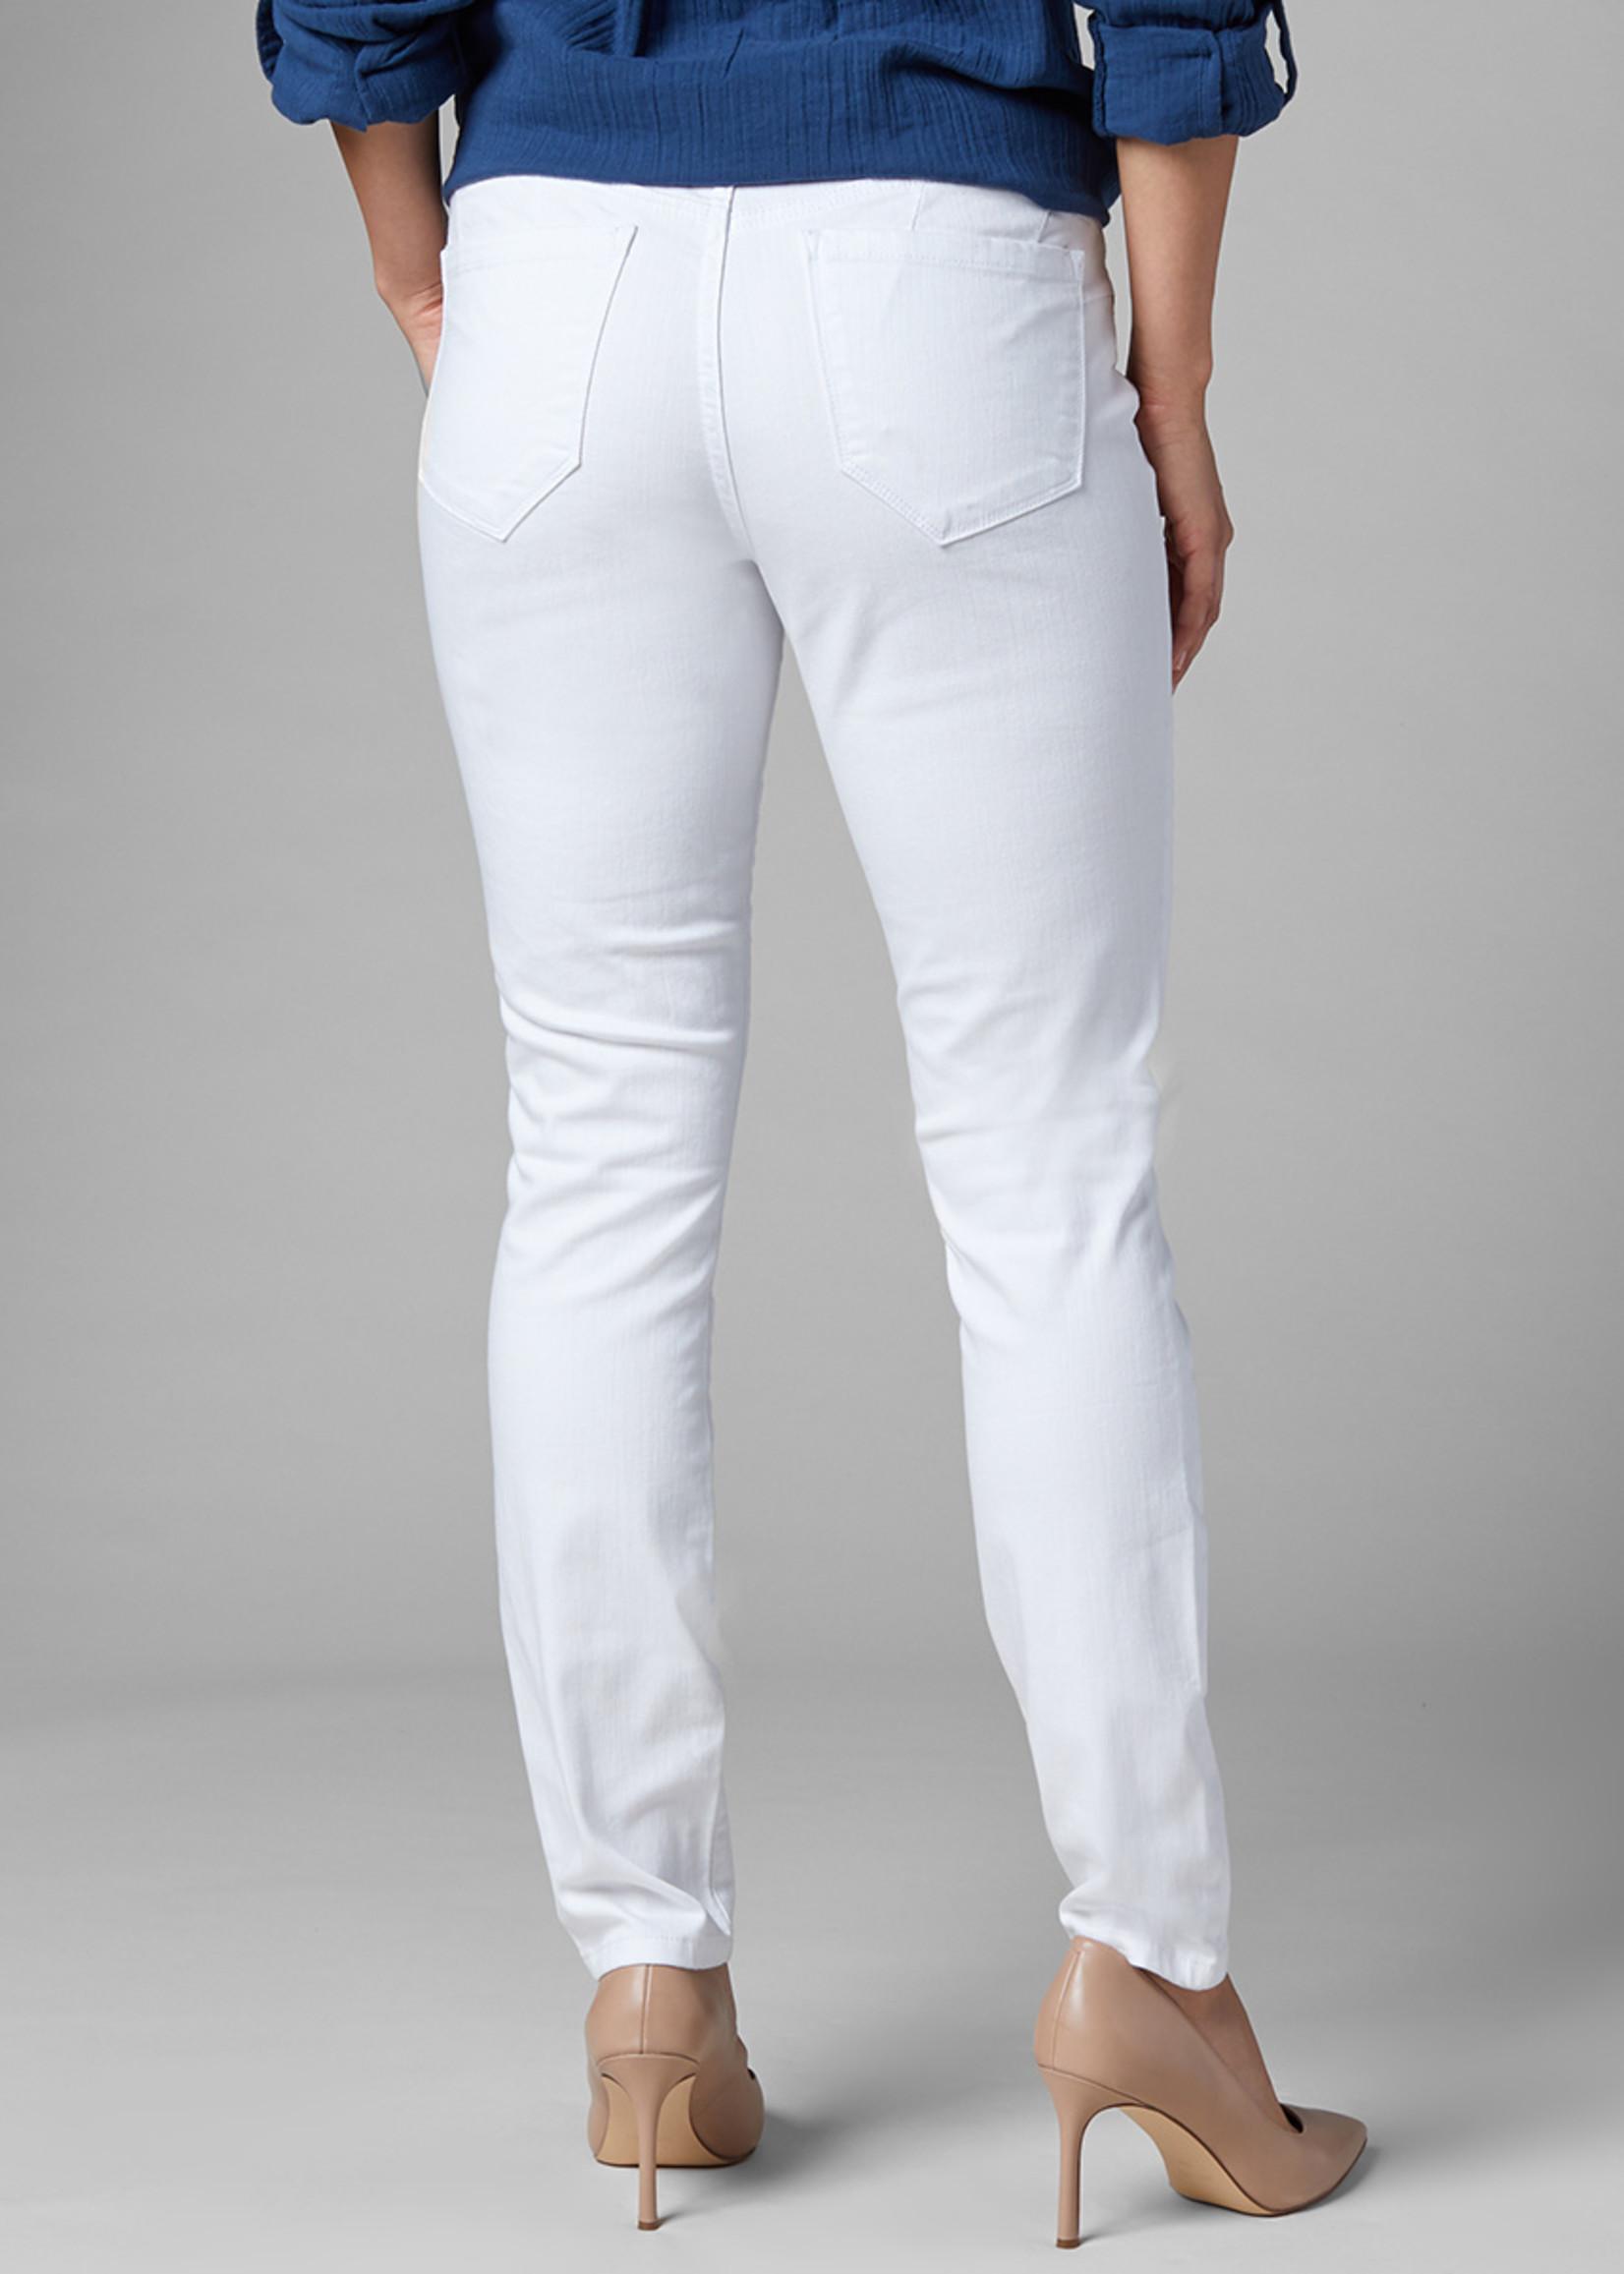 Jag Jeans Cecilia Skinny Jeans